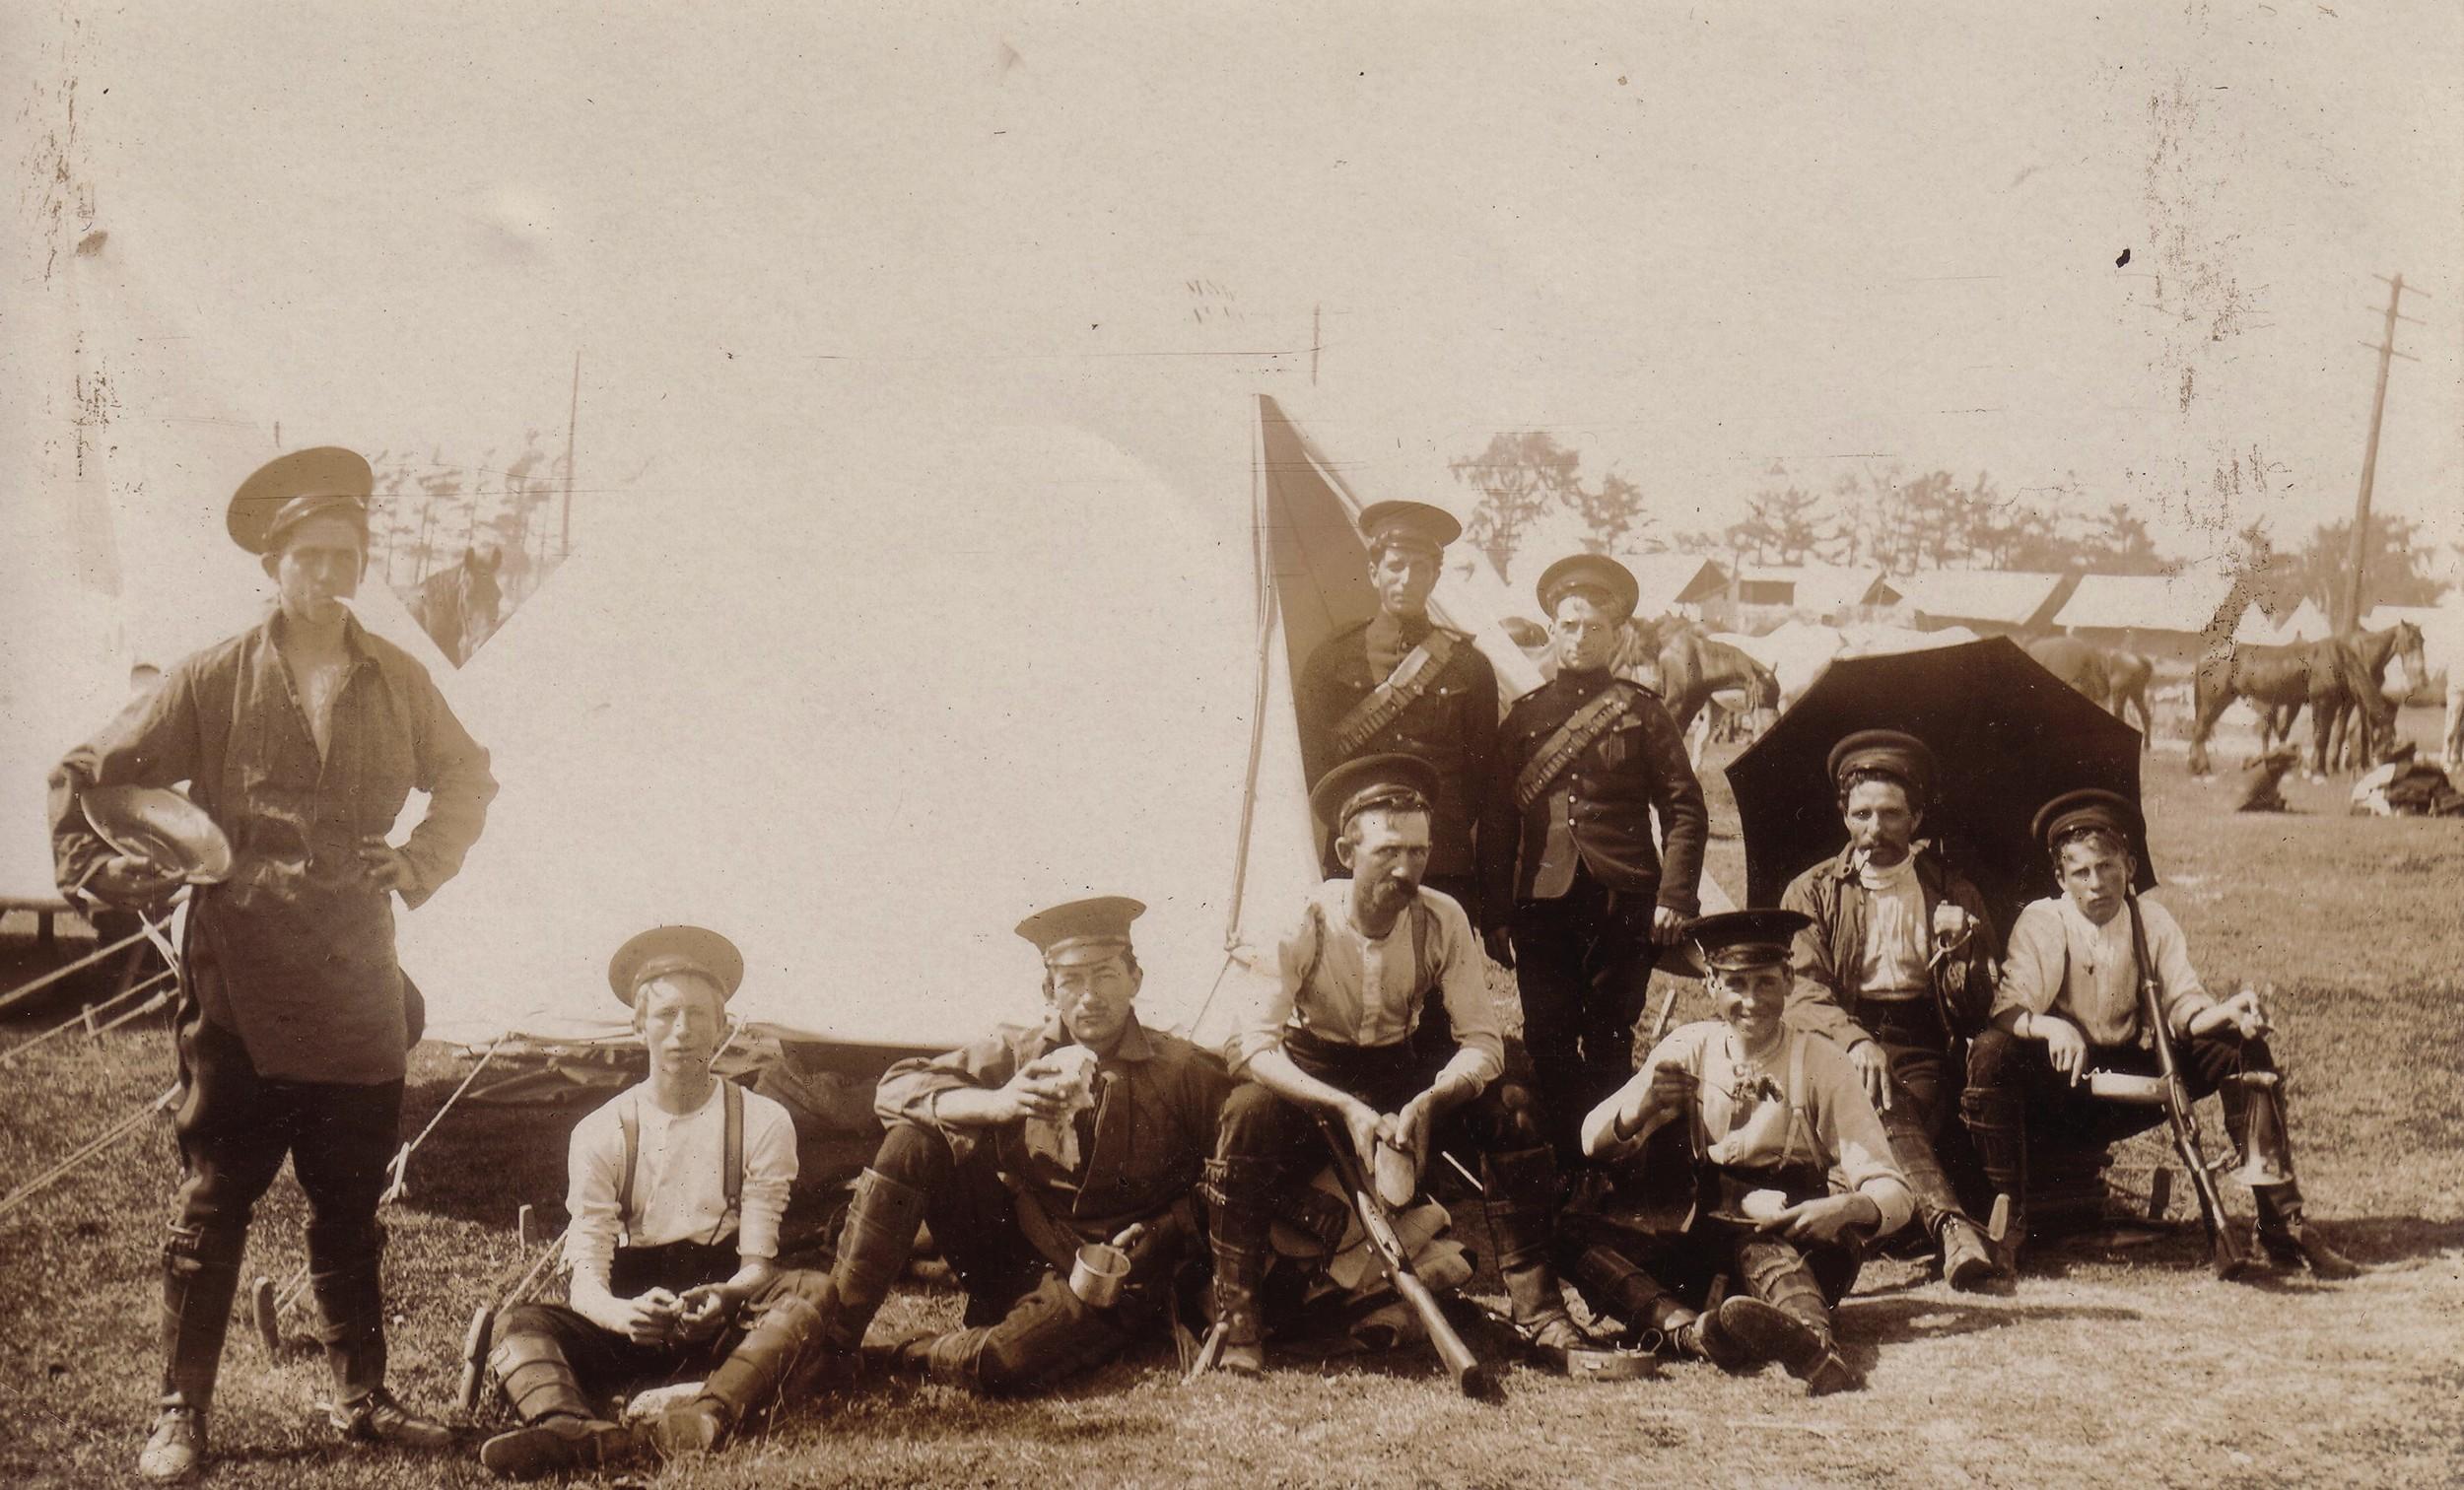 WW1 Training Camp